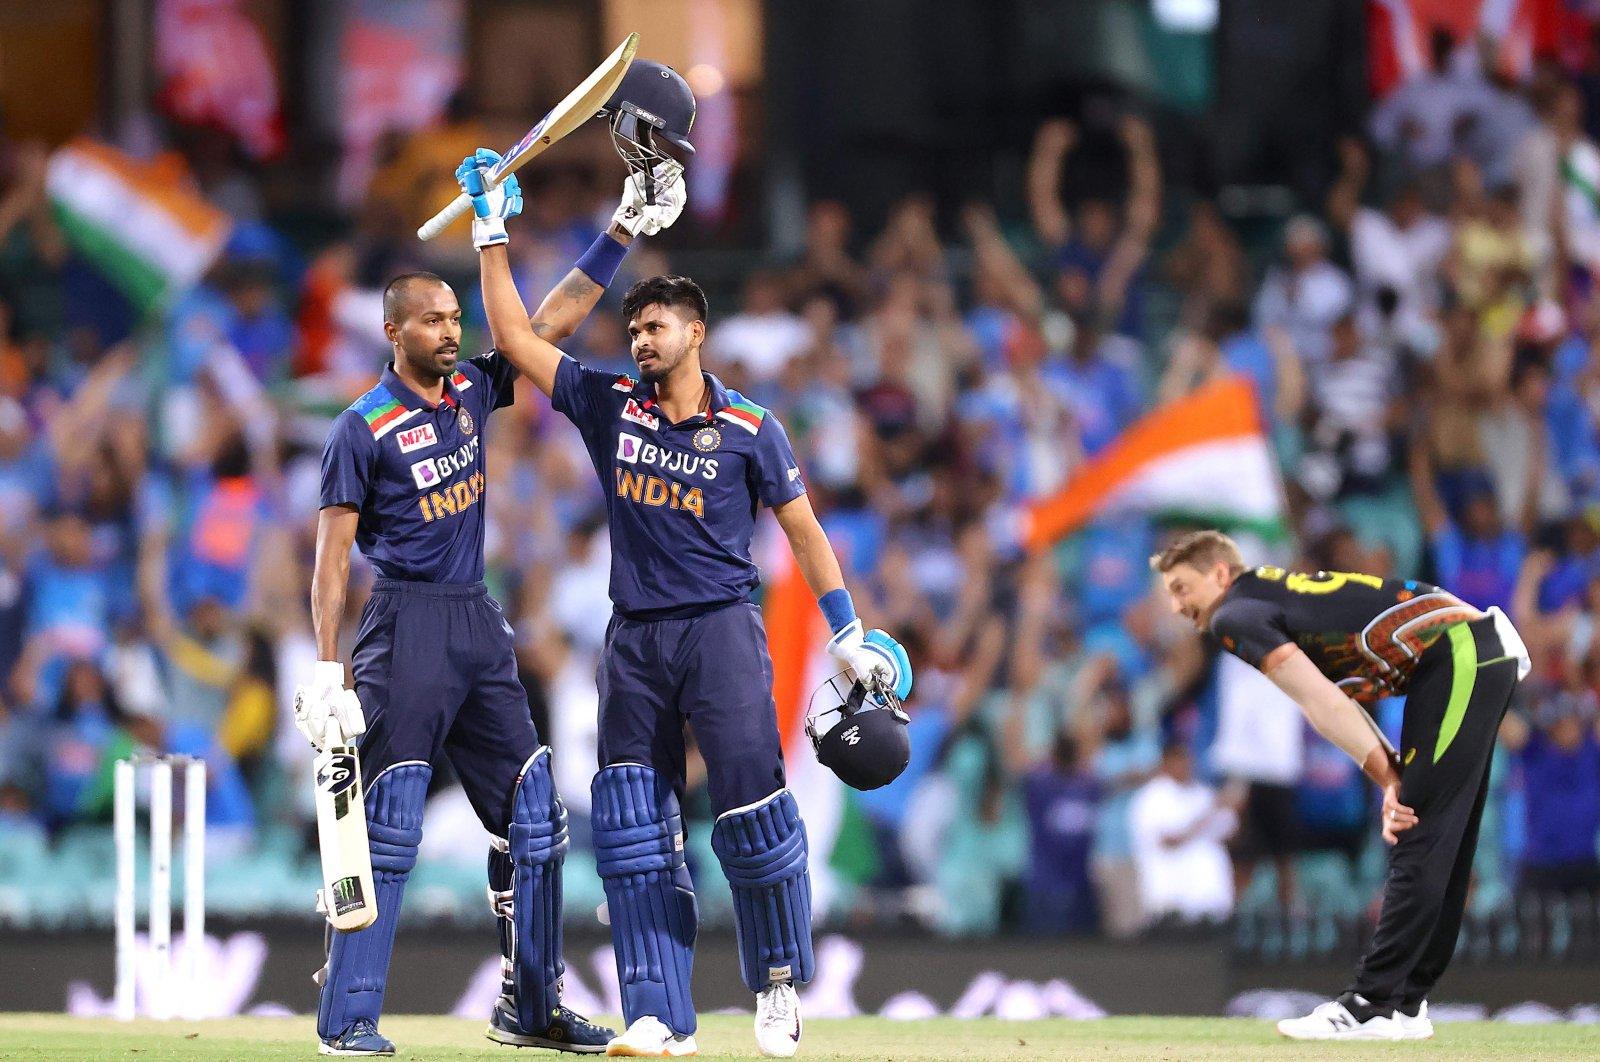 India's Hardik Pandya (L) and teammate Shreyas Iyer celebrate the victory, in Sydney, Australia, Dec. 6, 2020. (AFP PHOTO)